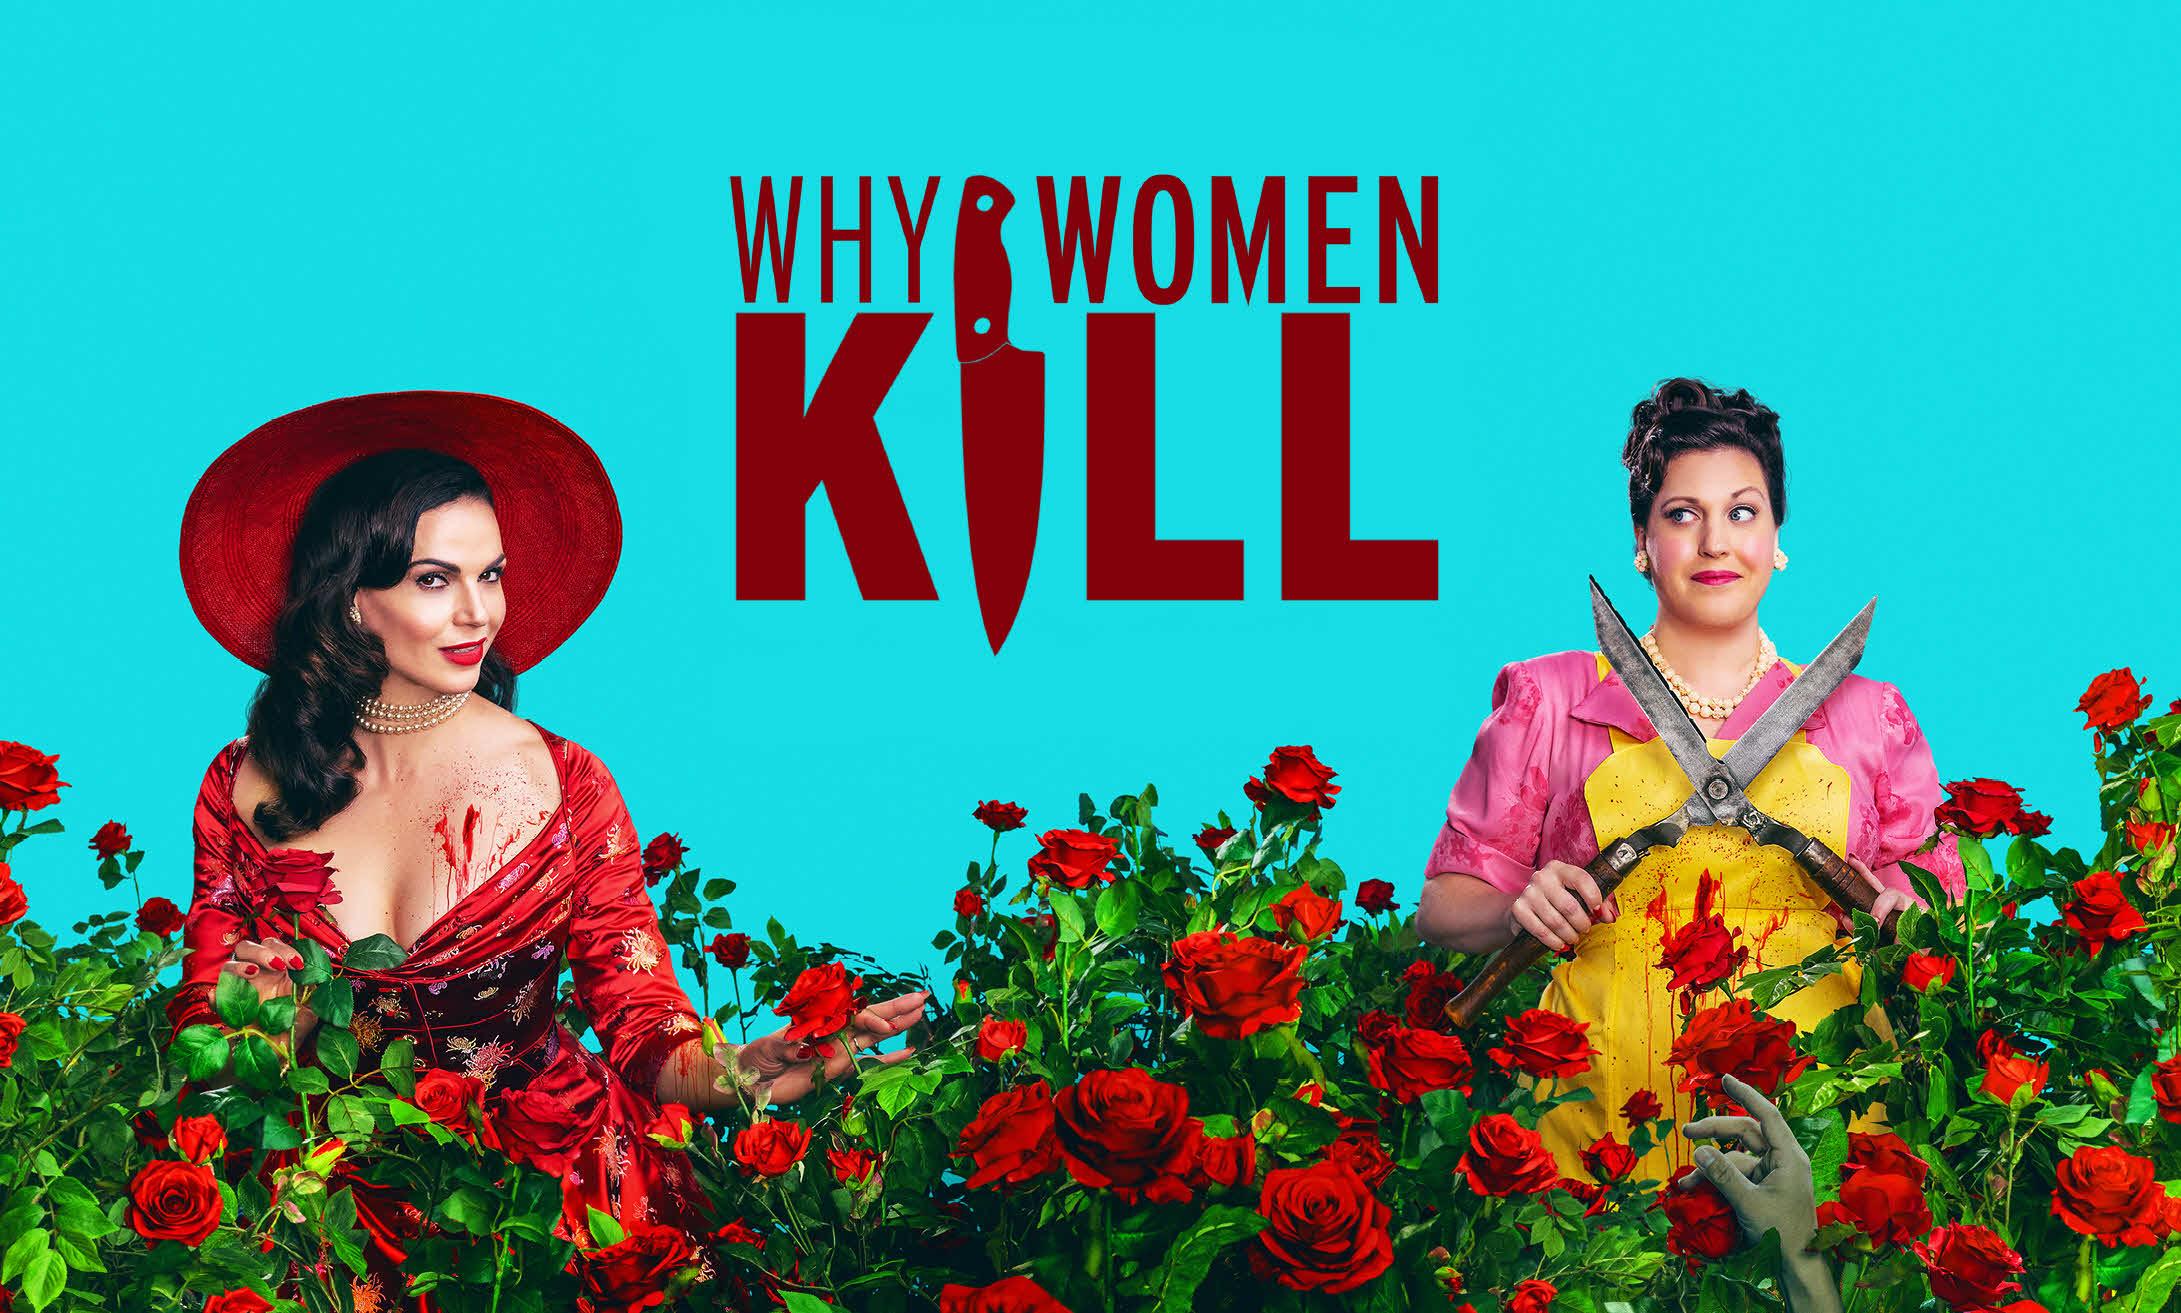 Why Women Kill - season 2 on TG4